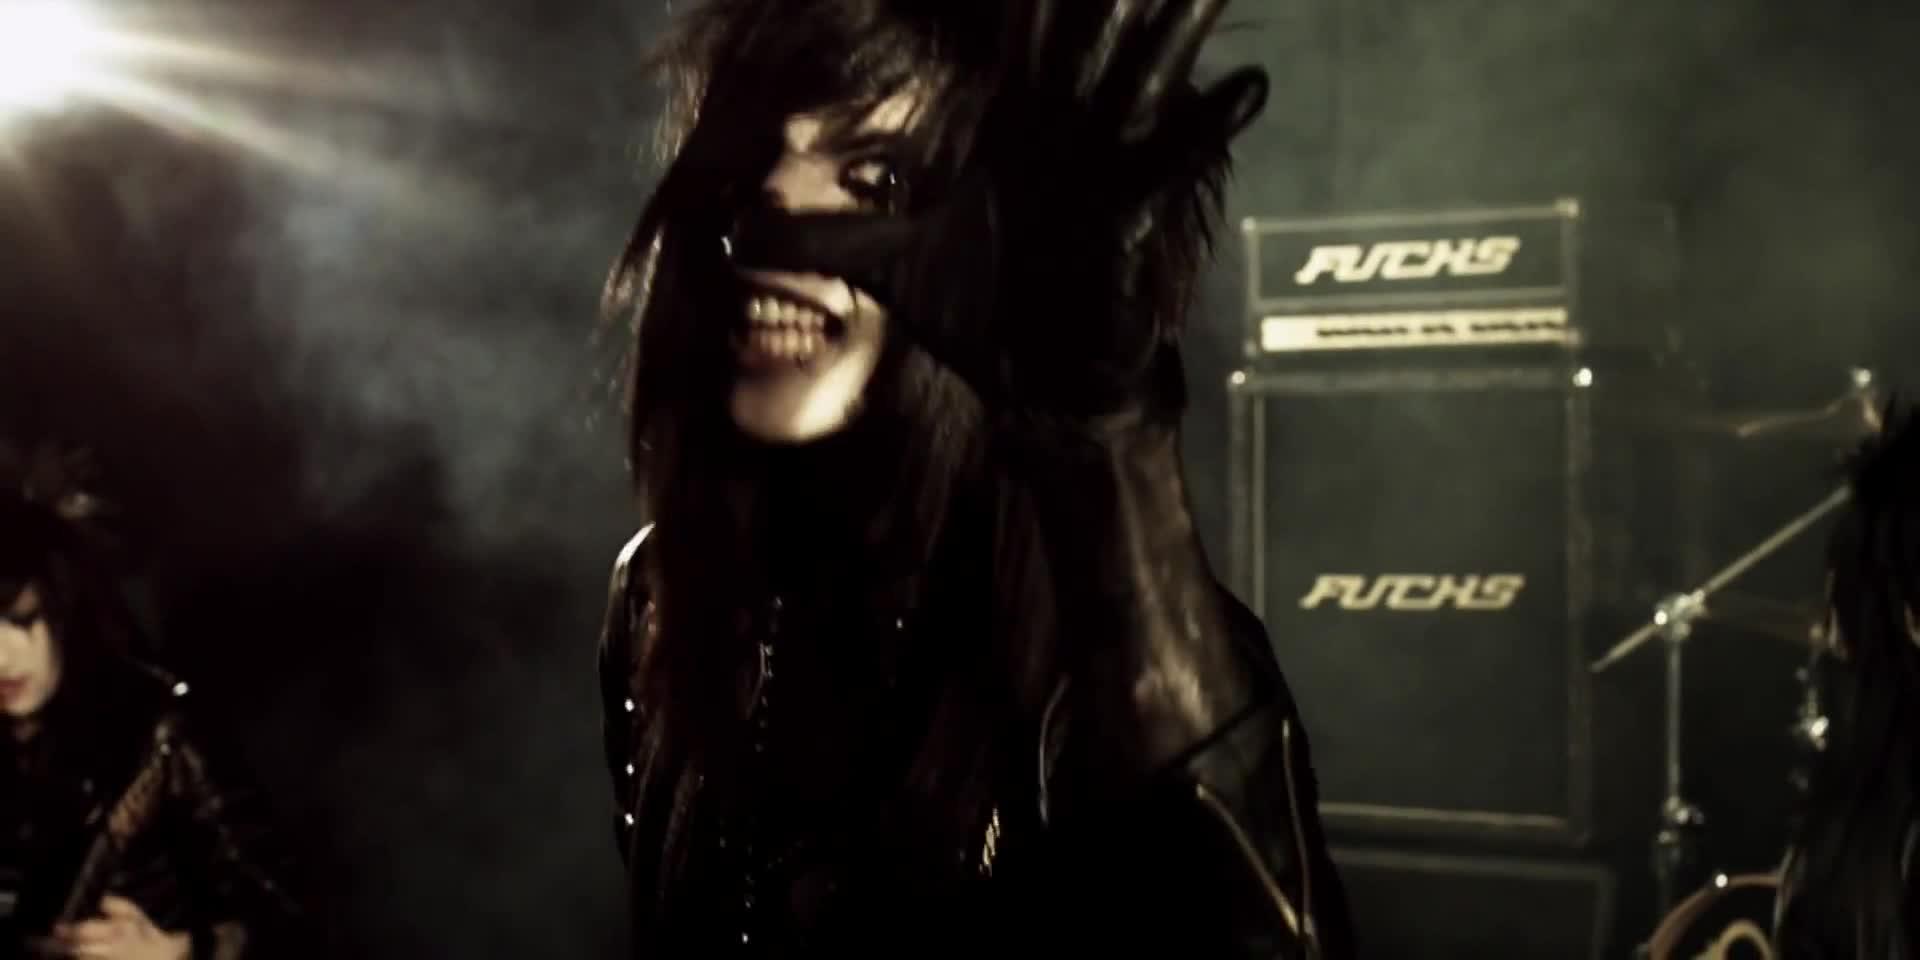 Black Veil Brides - Perfect Weapon {Music Video} - Black ...